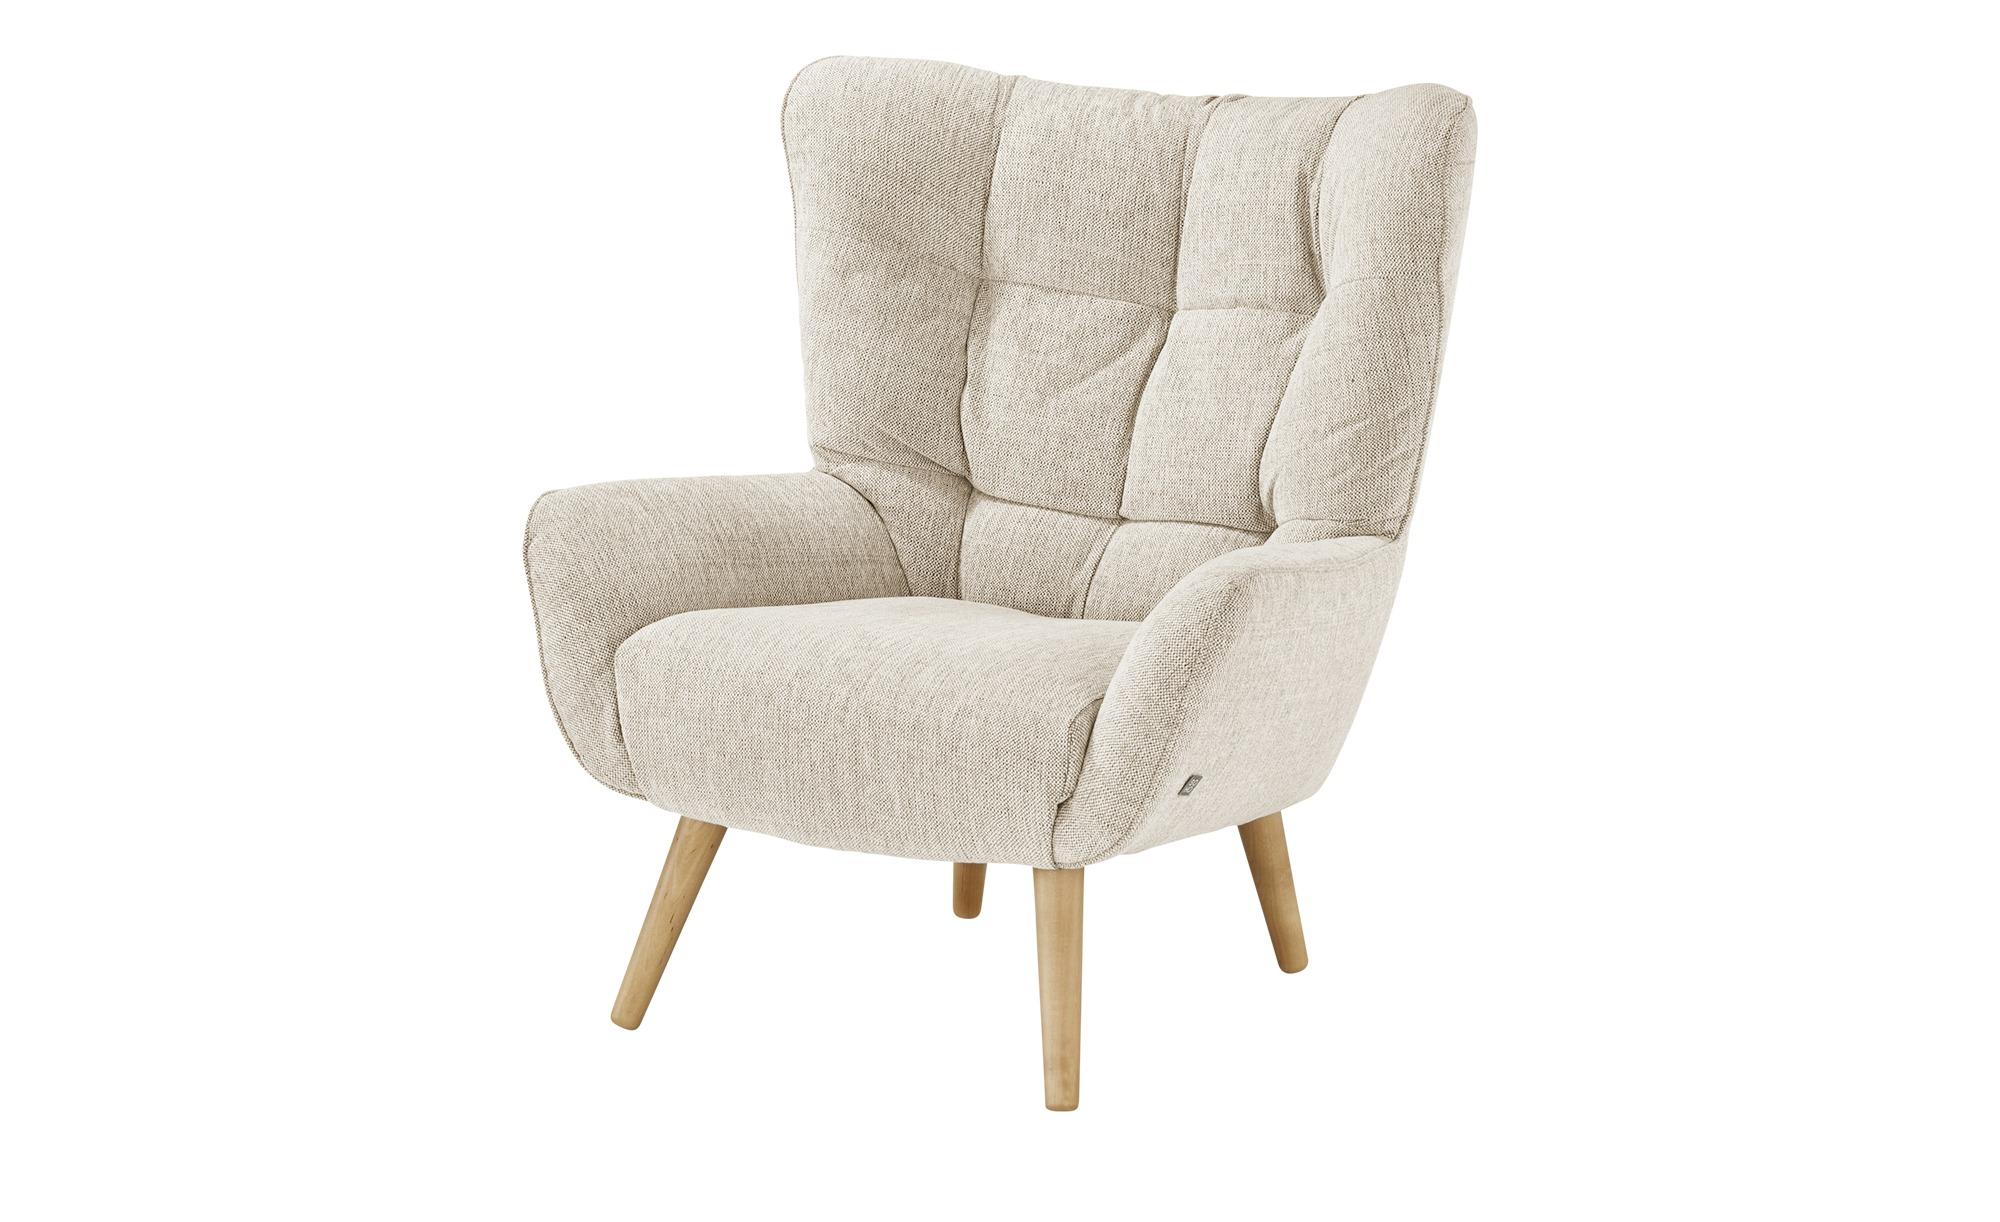 SOHO Polstersessel  Jolyn ¦ beige ¦ Maße (cm): B: 87 H: 100 T: 86 Polstermöbel > Sessel > Ohrensessel - Höffner